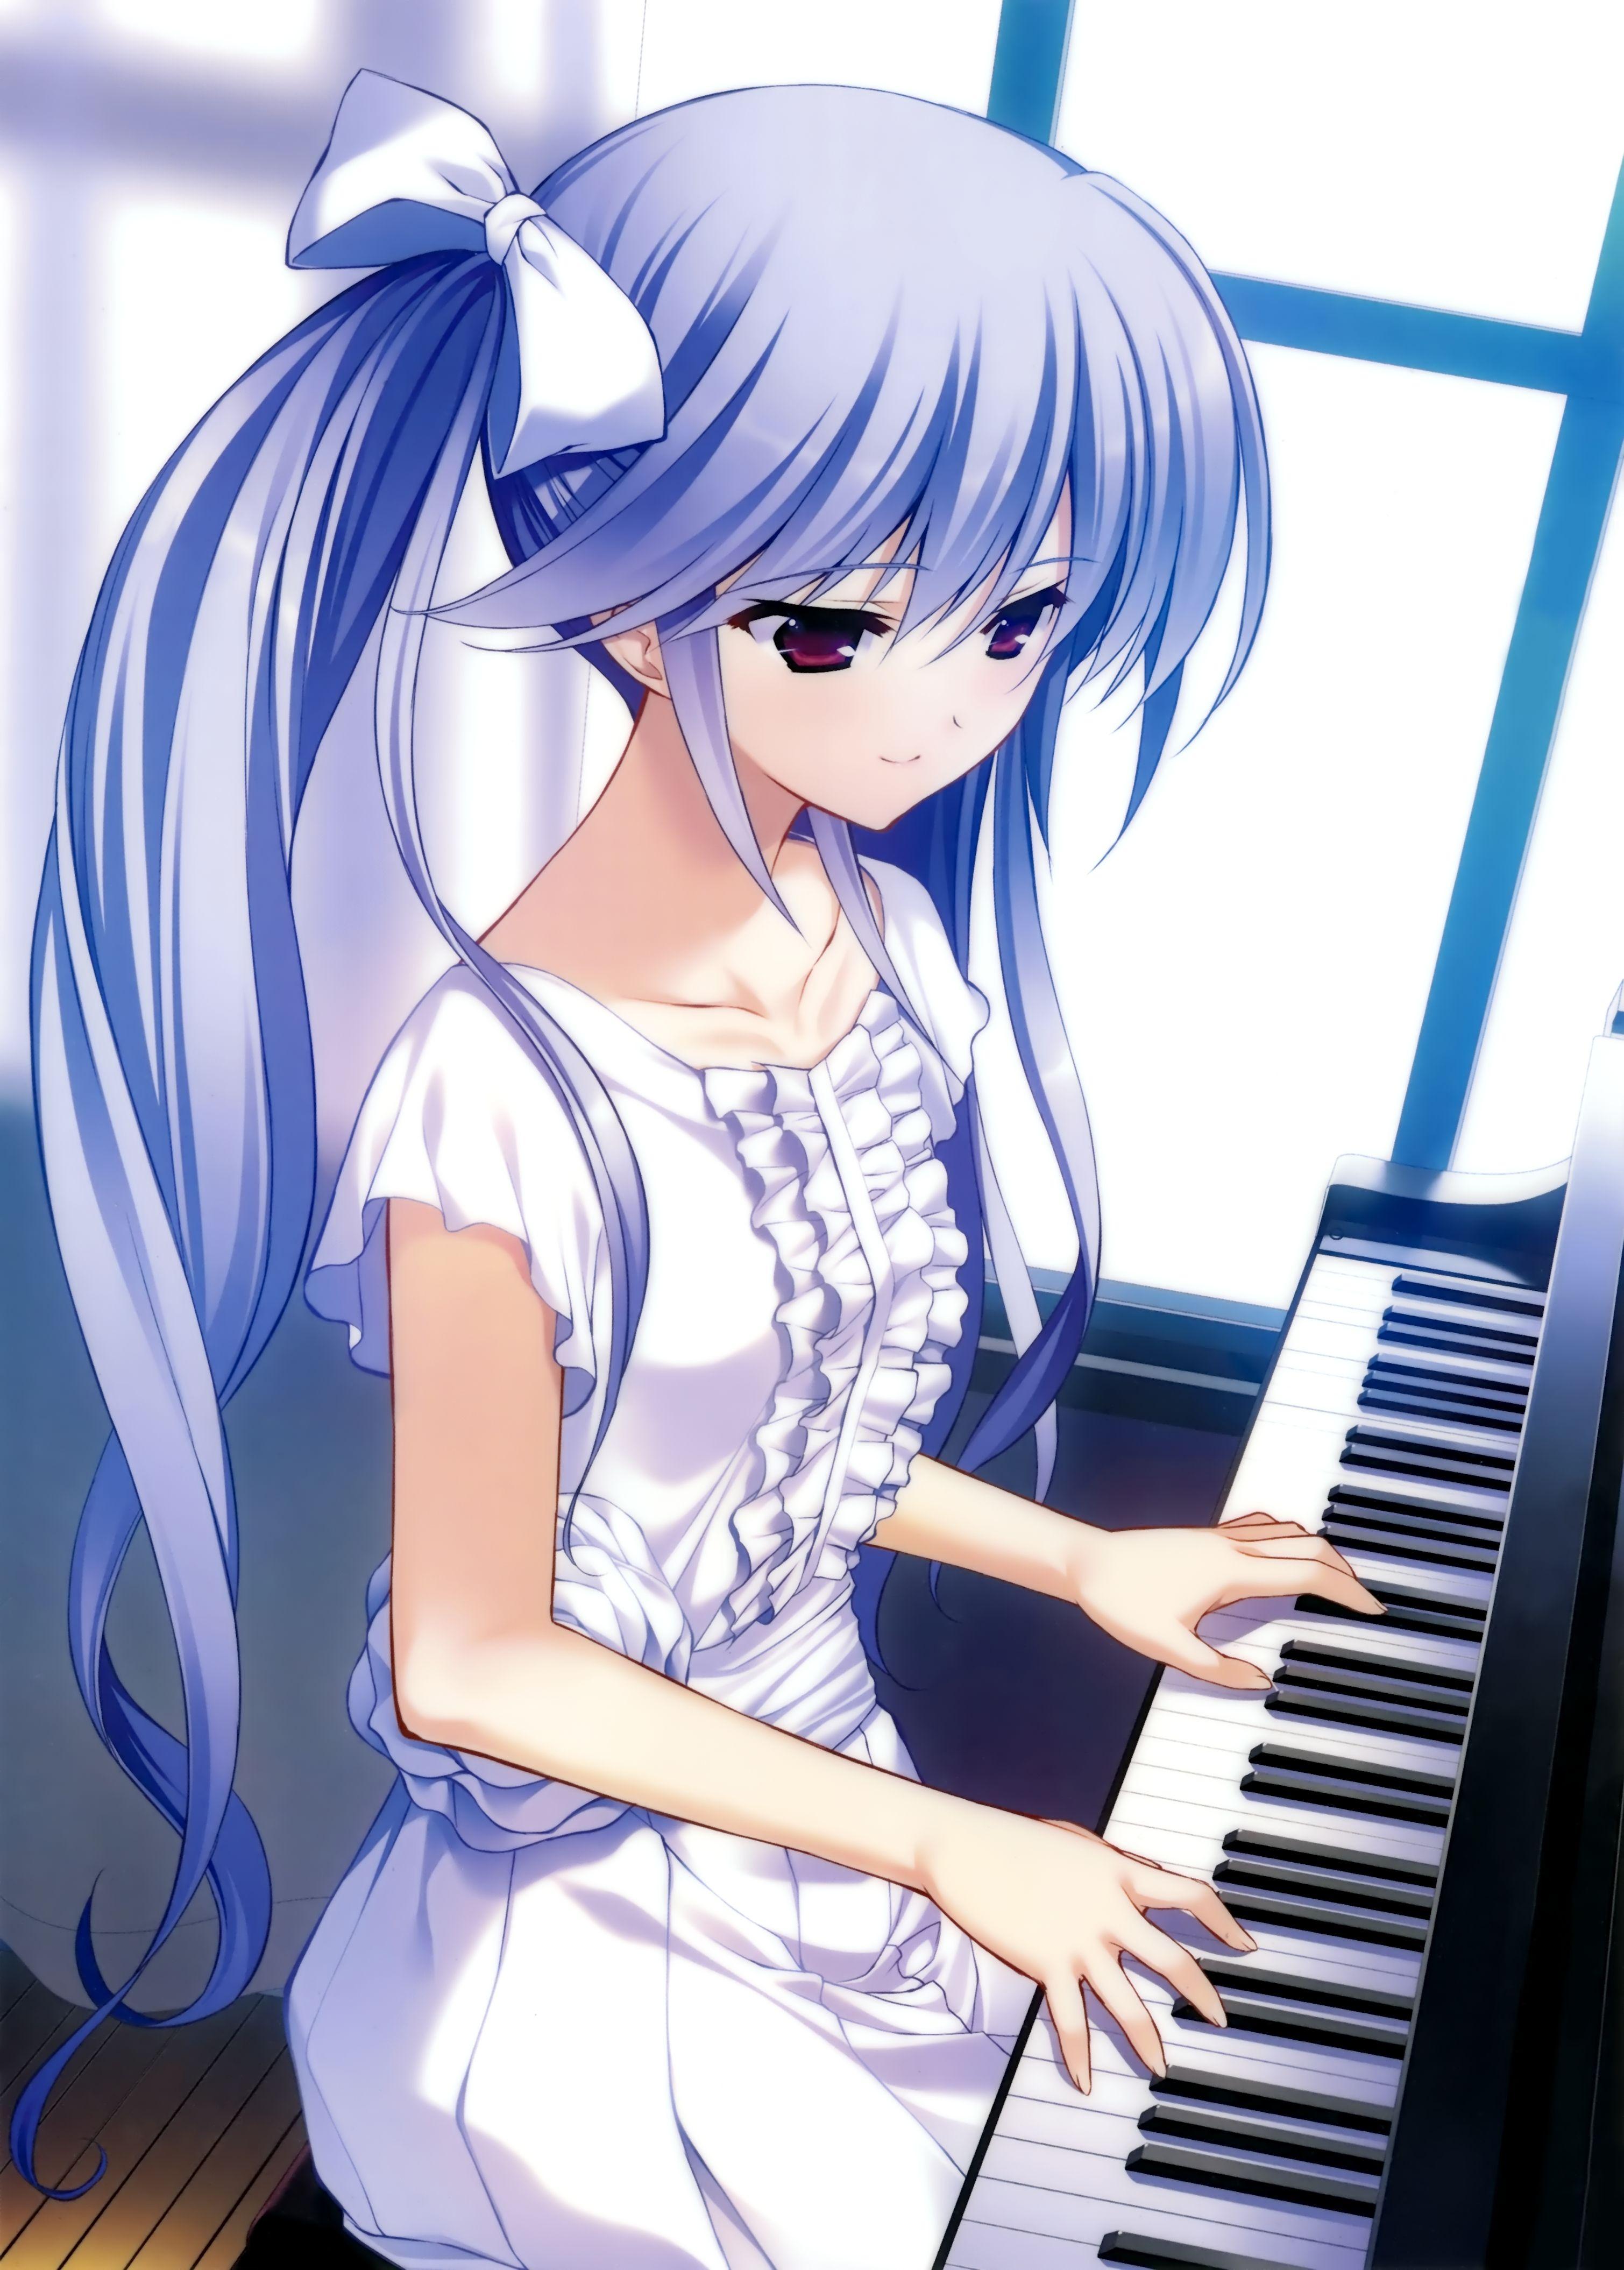 Anime Art Music Musician Piano Pianist Blue Hair Dress Lace Hair Bow Long Hair Ponytail Anime Devushka Anime Muzyka